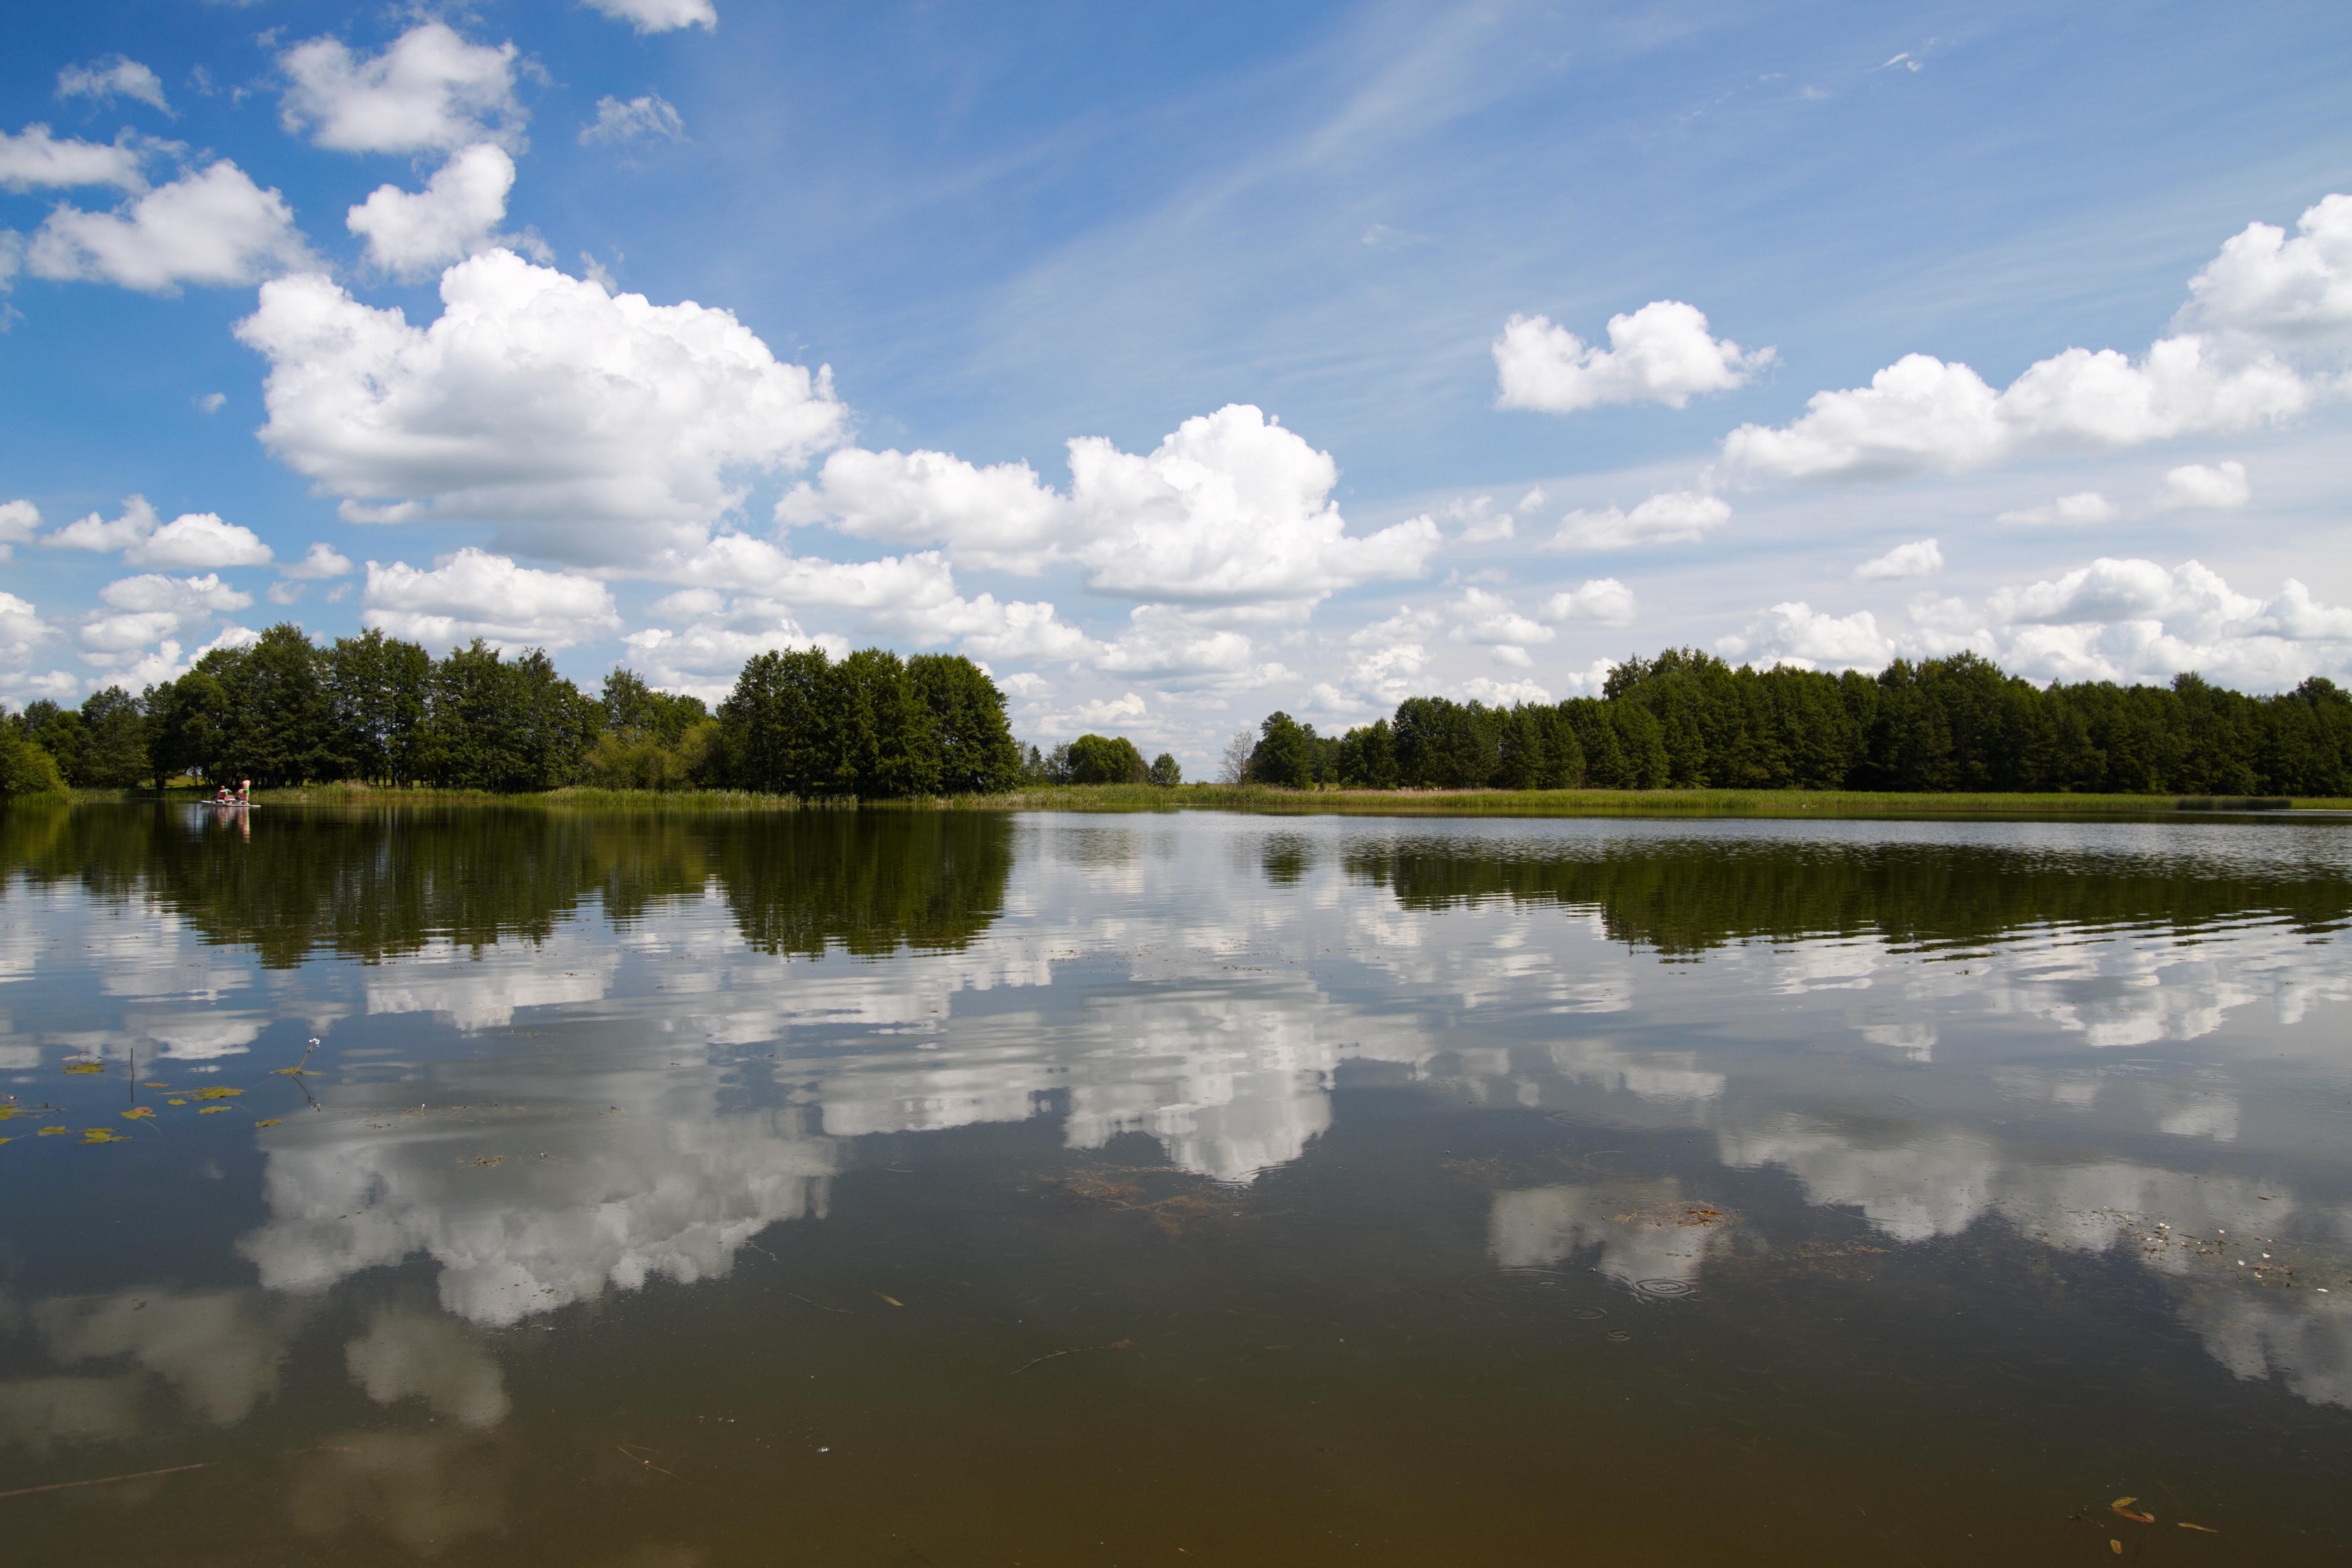 Lithuania has beautiful lakes